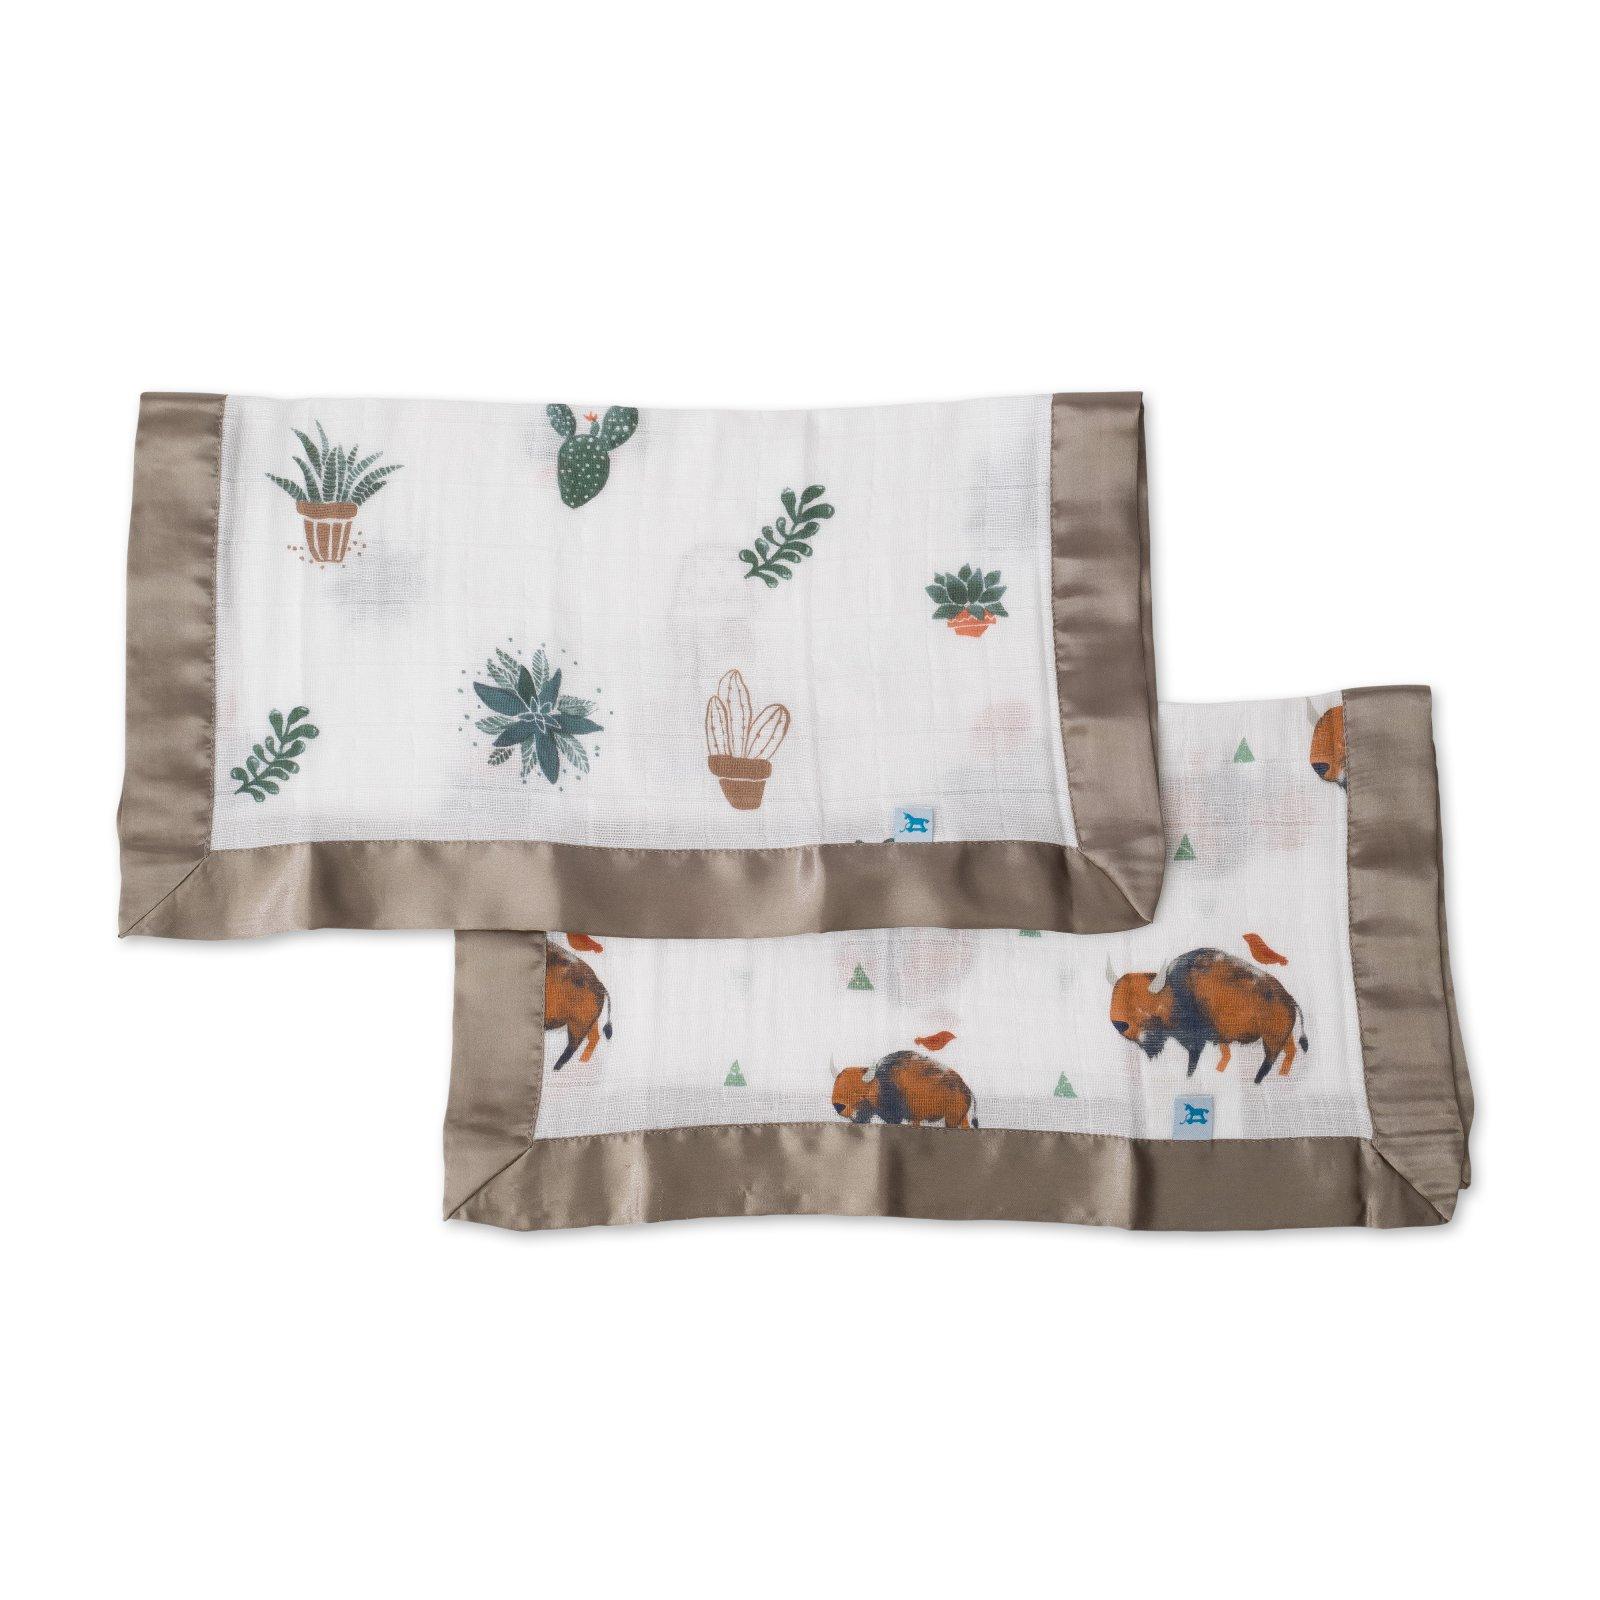 Little Unicorn Cotton Muslin Security Blanket 2 Pack - Bison + Prickle Pots